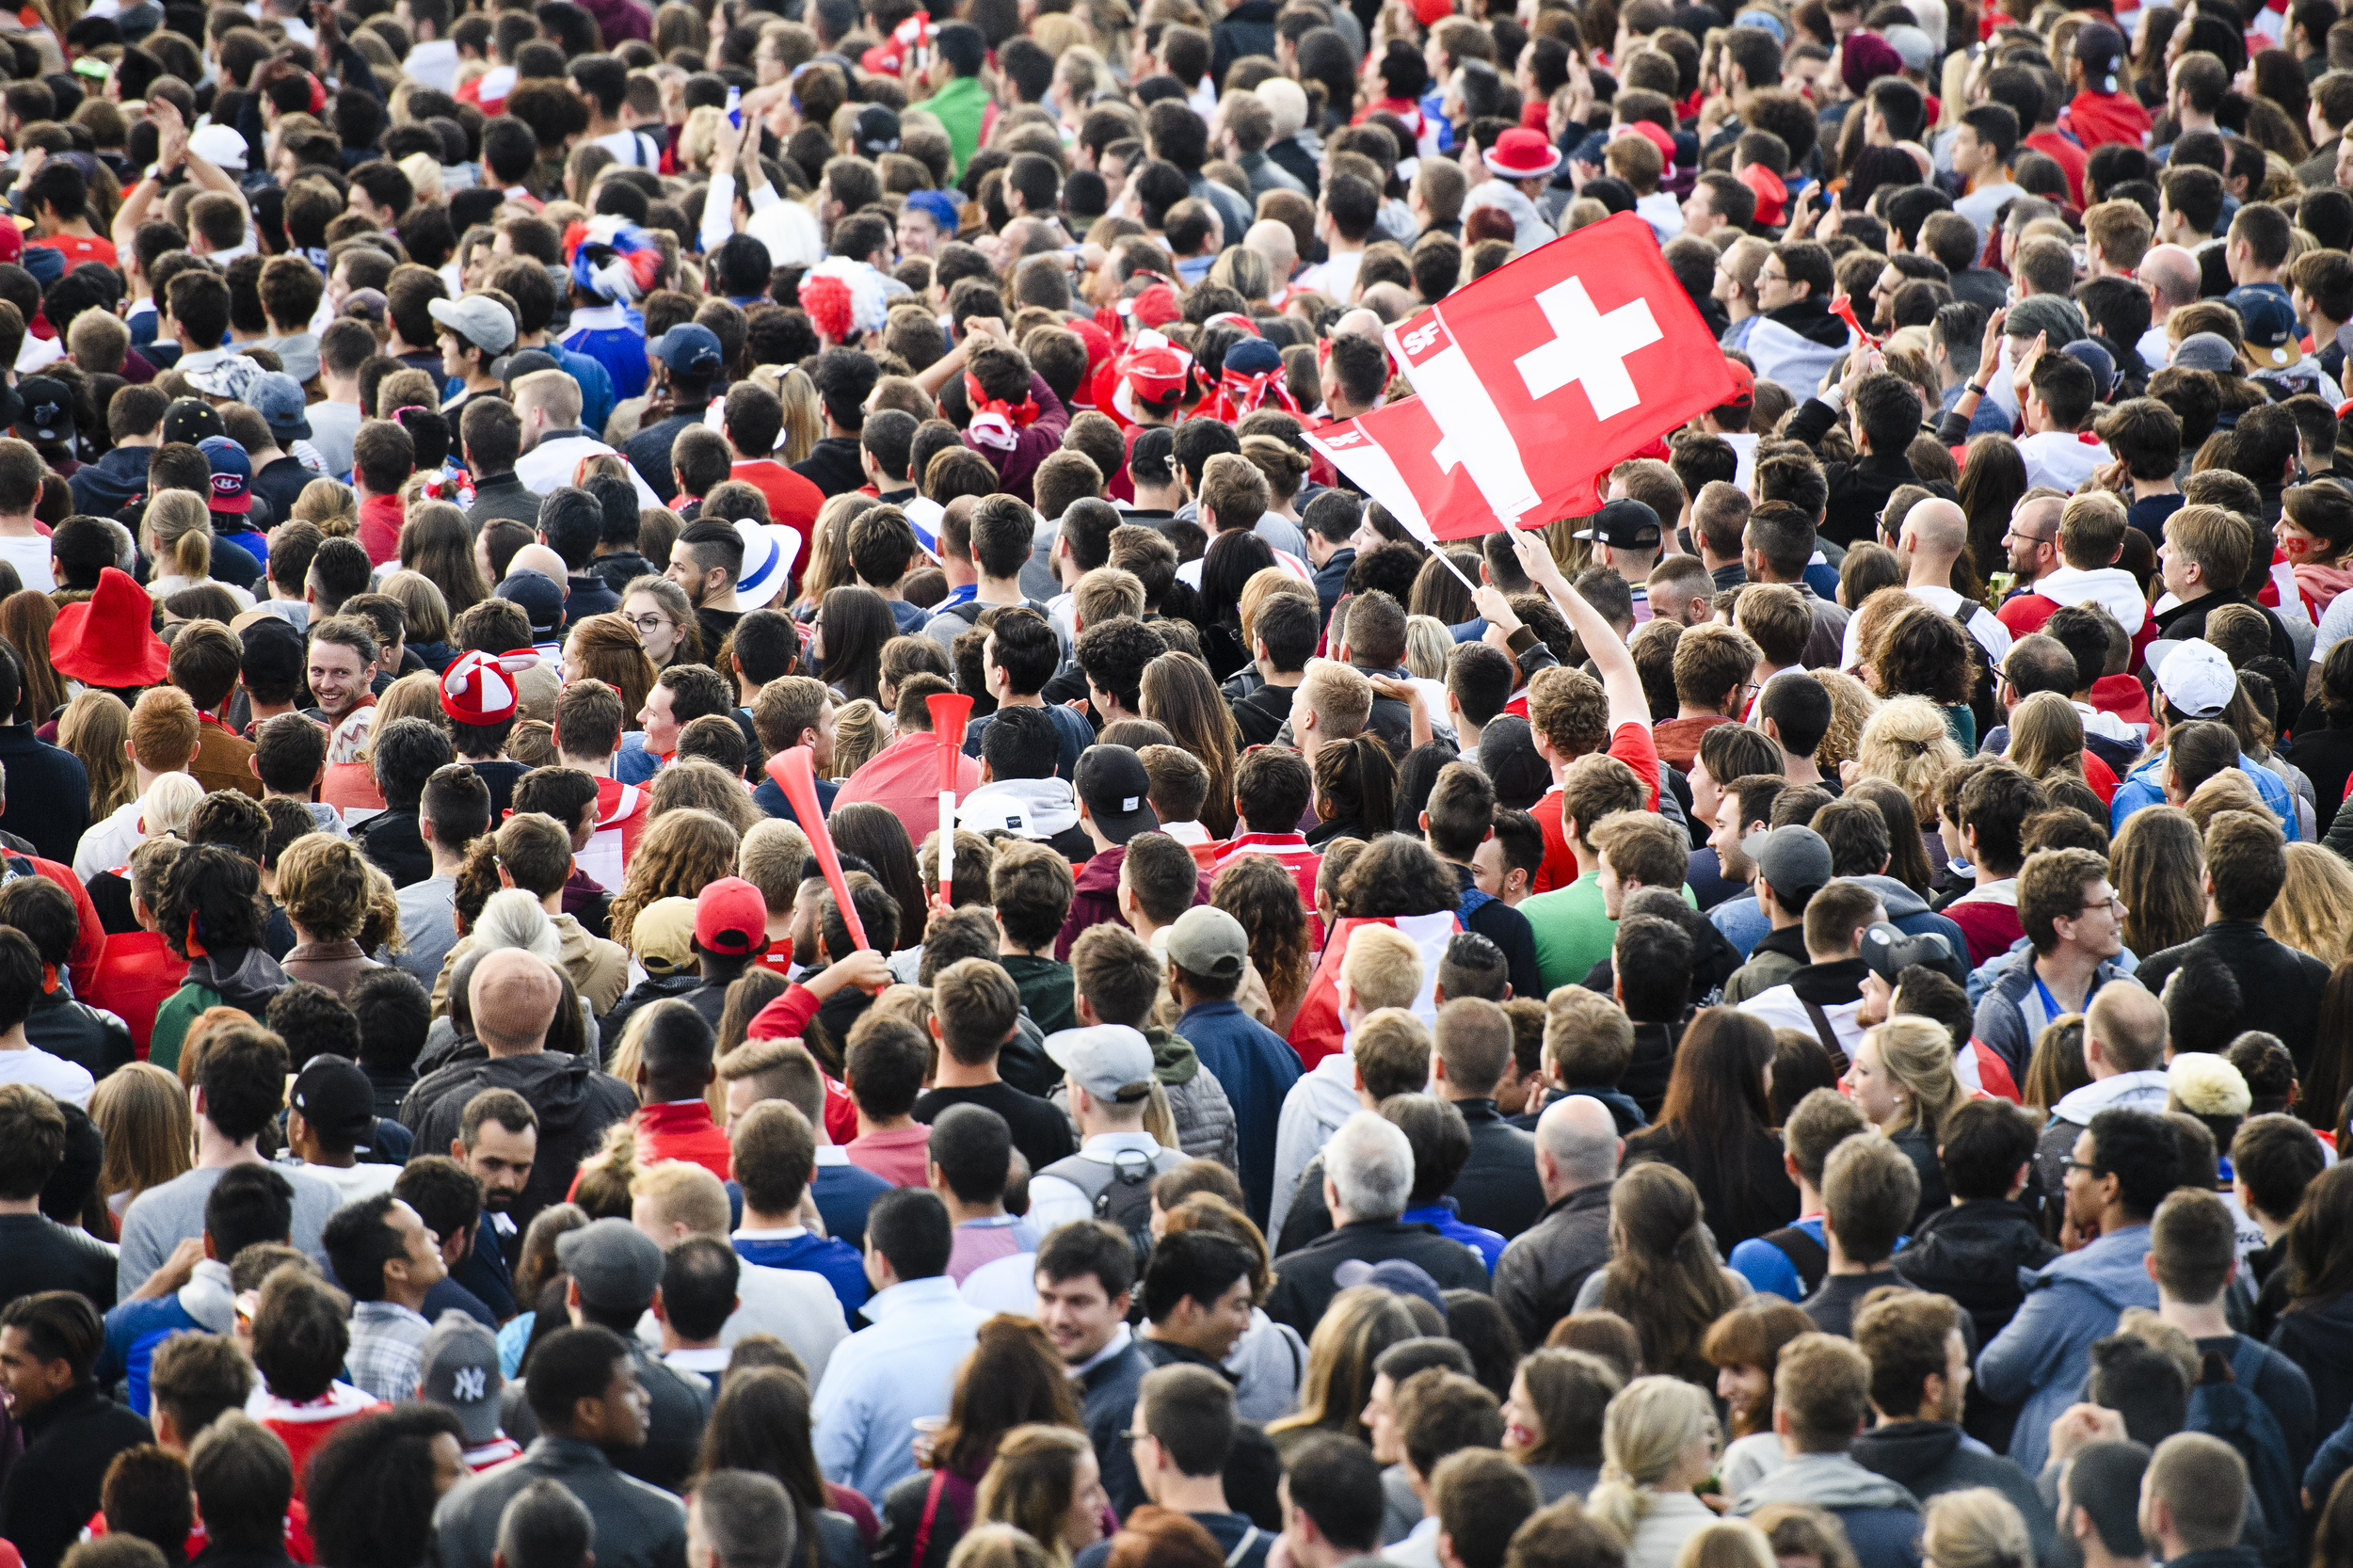 SWITZERLAND SOCCER PUBLIC VIEWING LAUSANNE